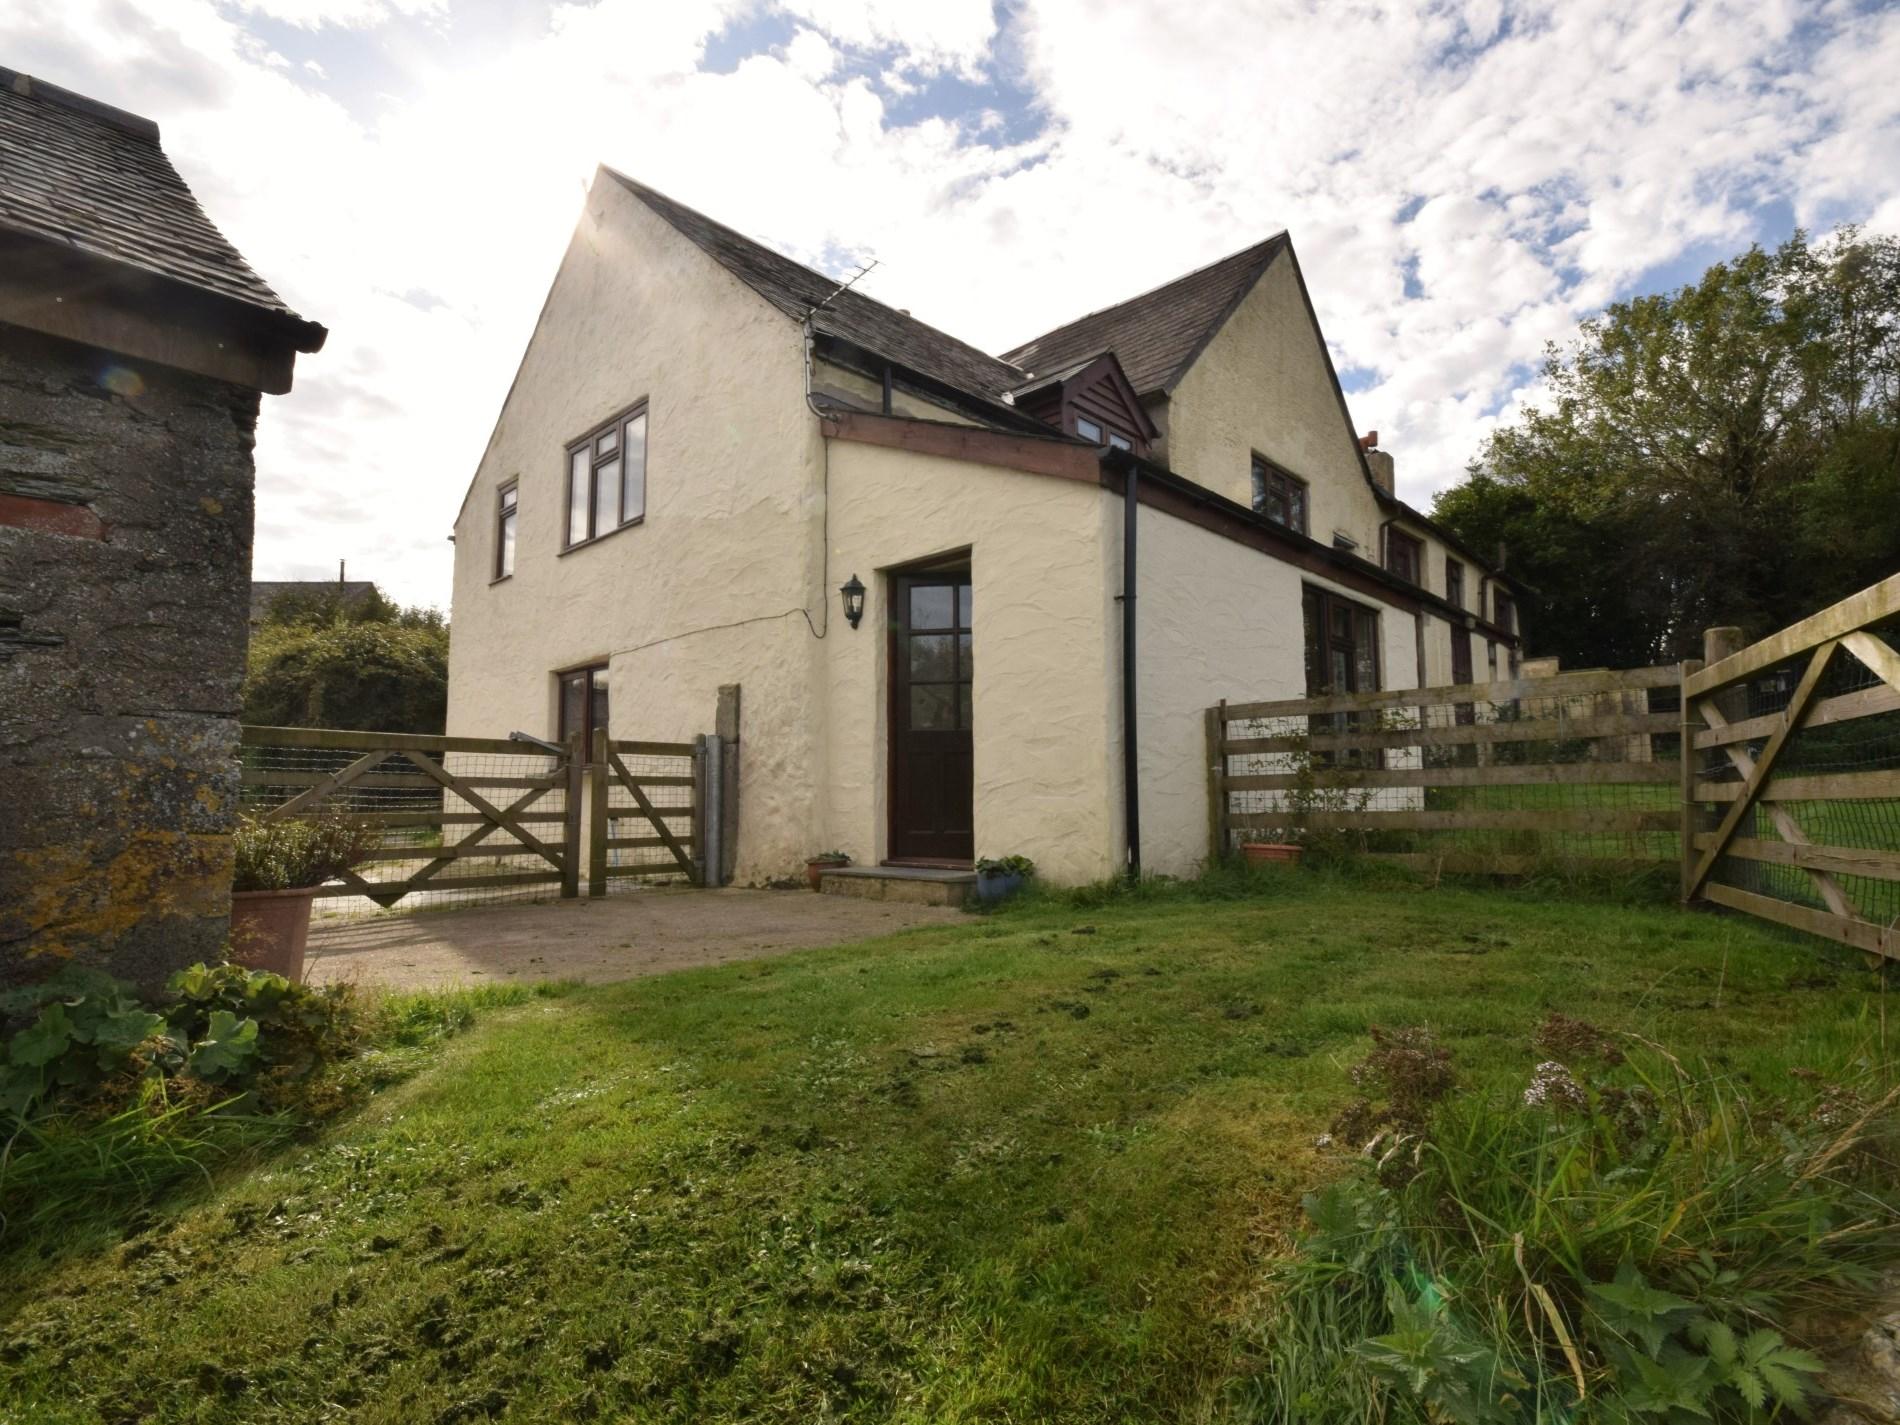 2 Bedroom Cottage in Woolacombe, Devon